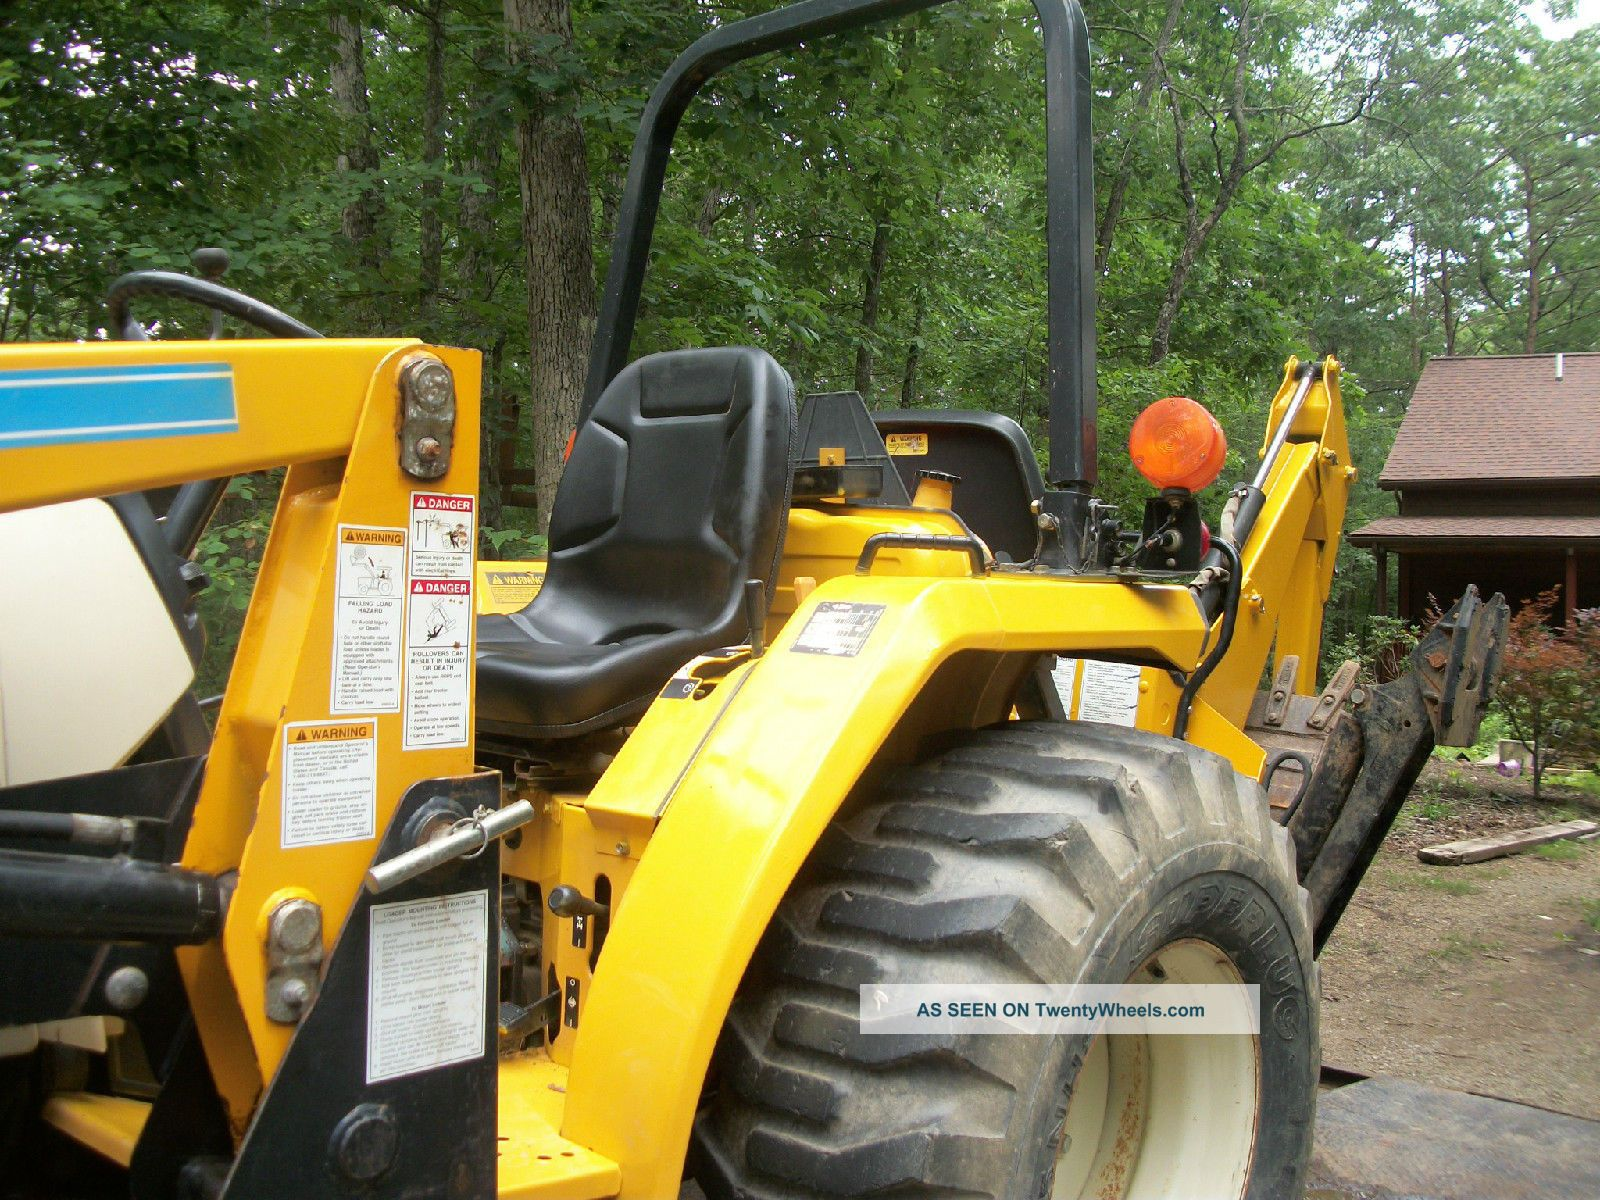 Cub Cadet Compact Tractors : Cub cadet compact tractor model with front loader and